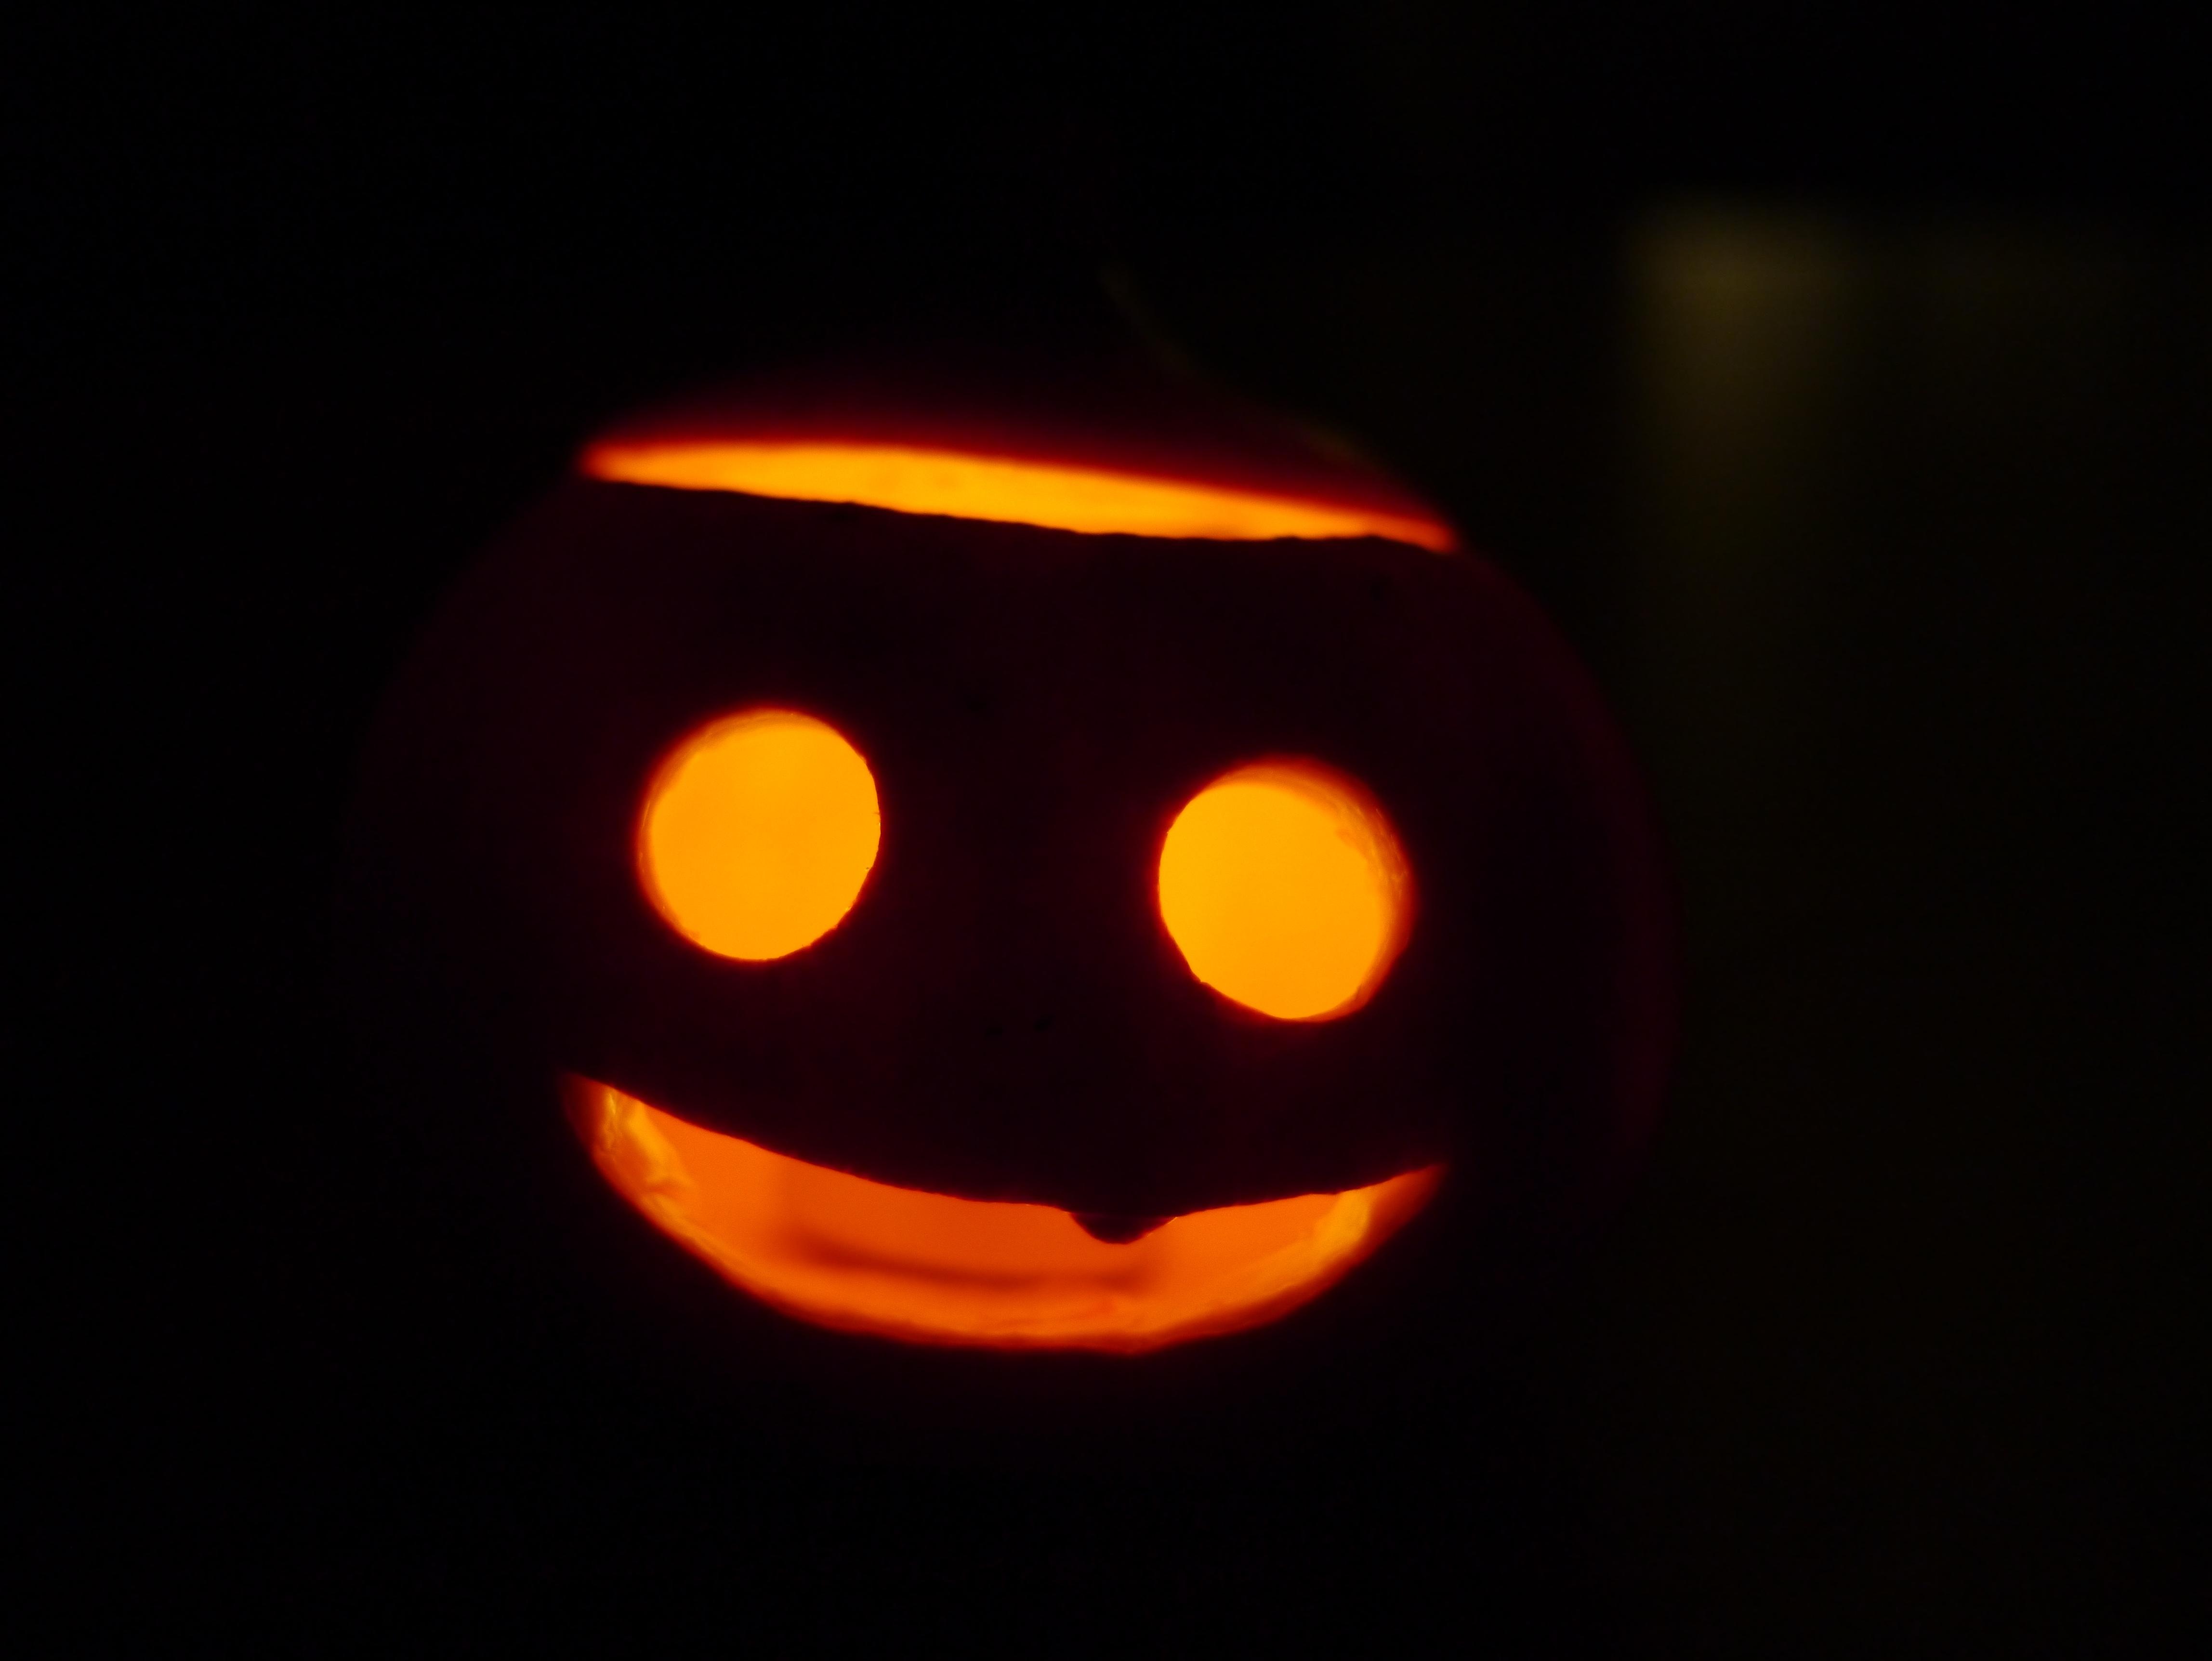 dark orange lantern pumpkin halloween jack o lantern funny halloween pumpkin